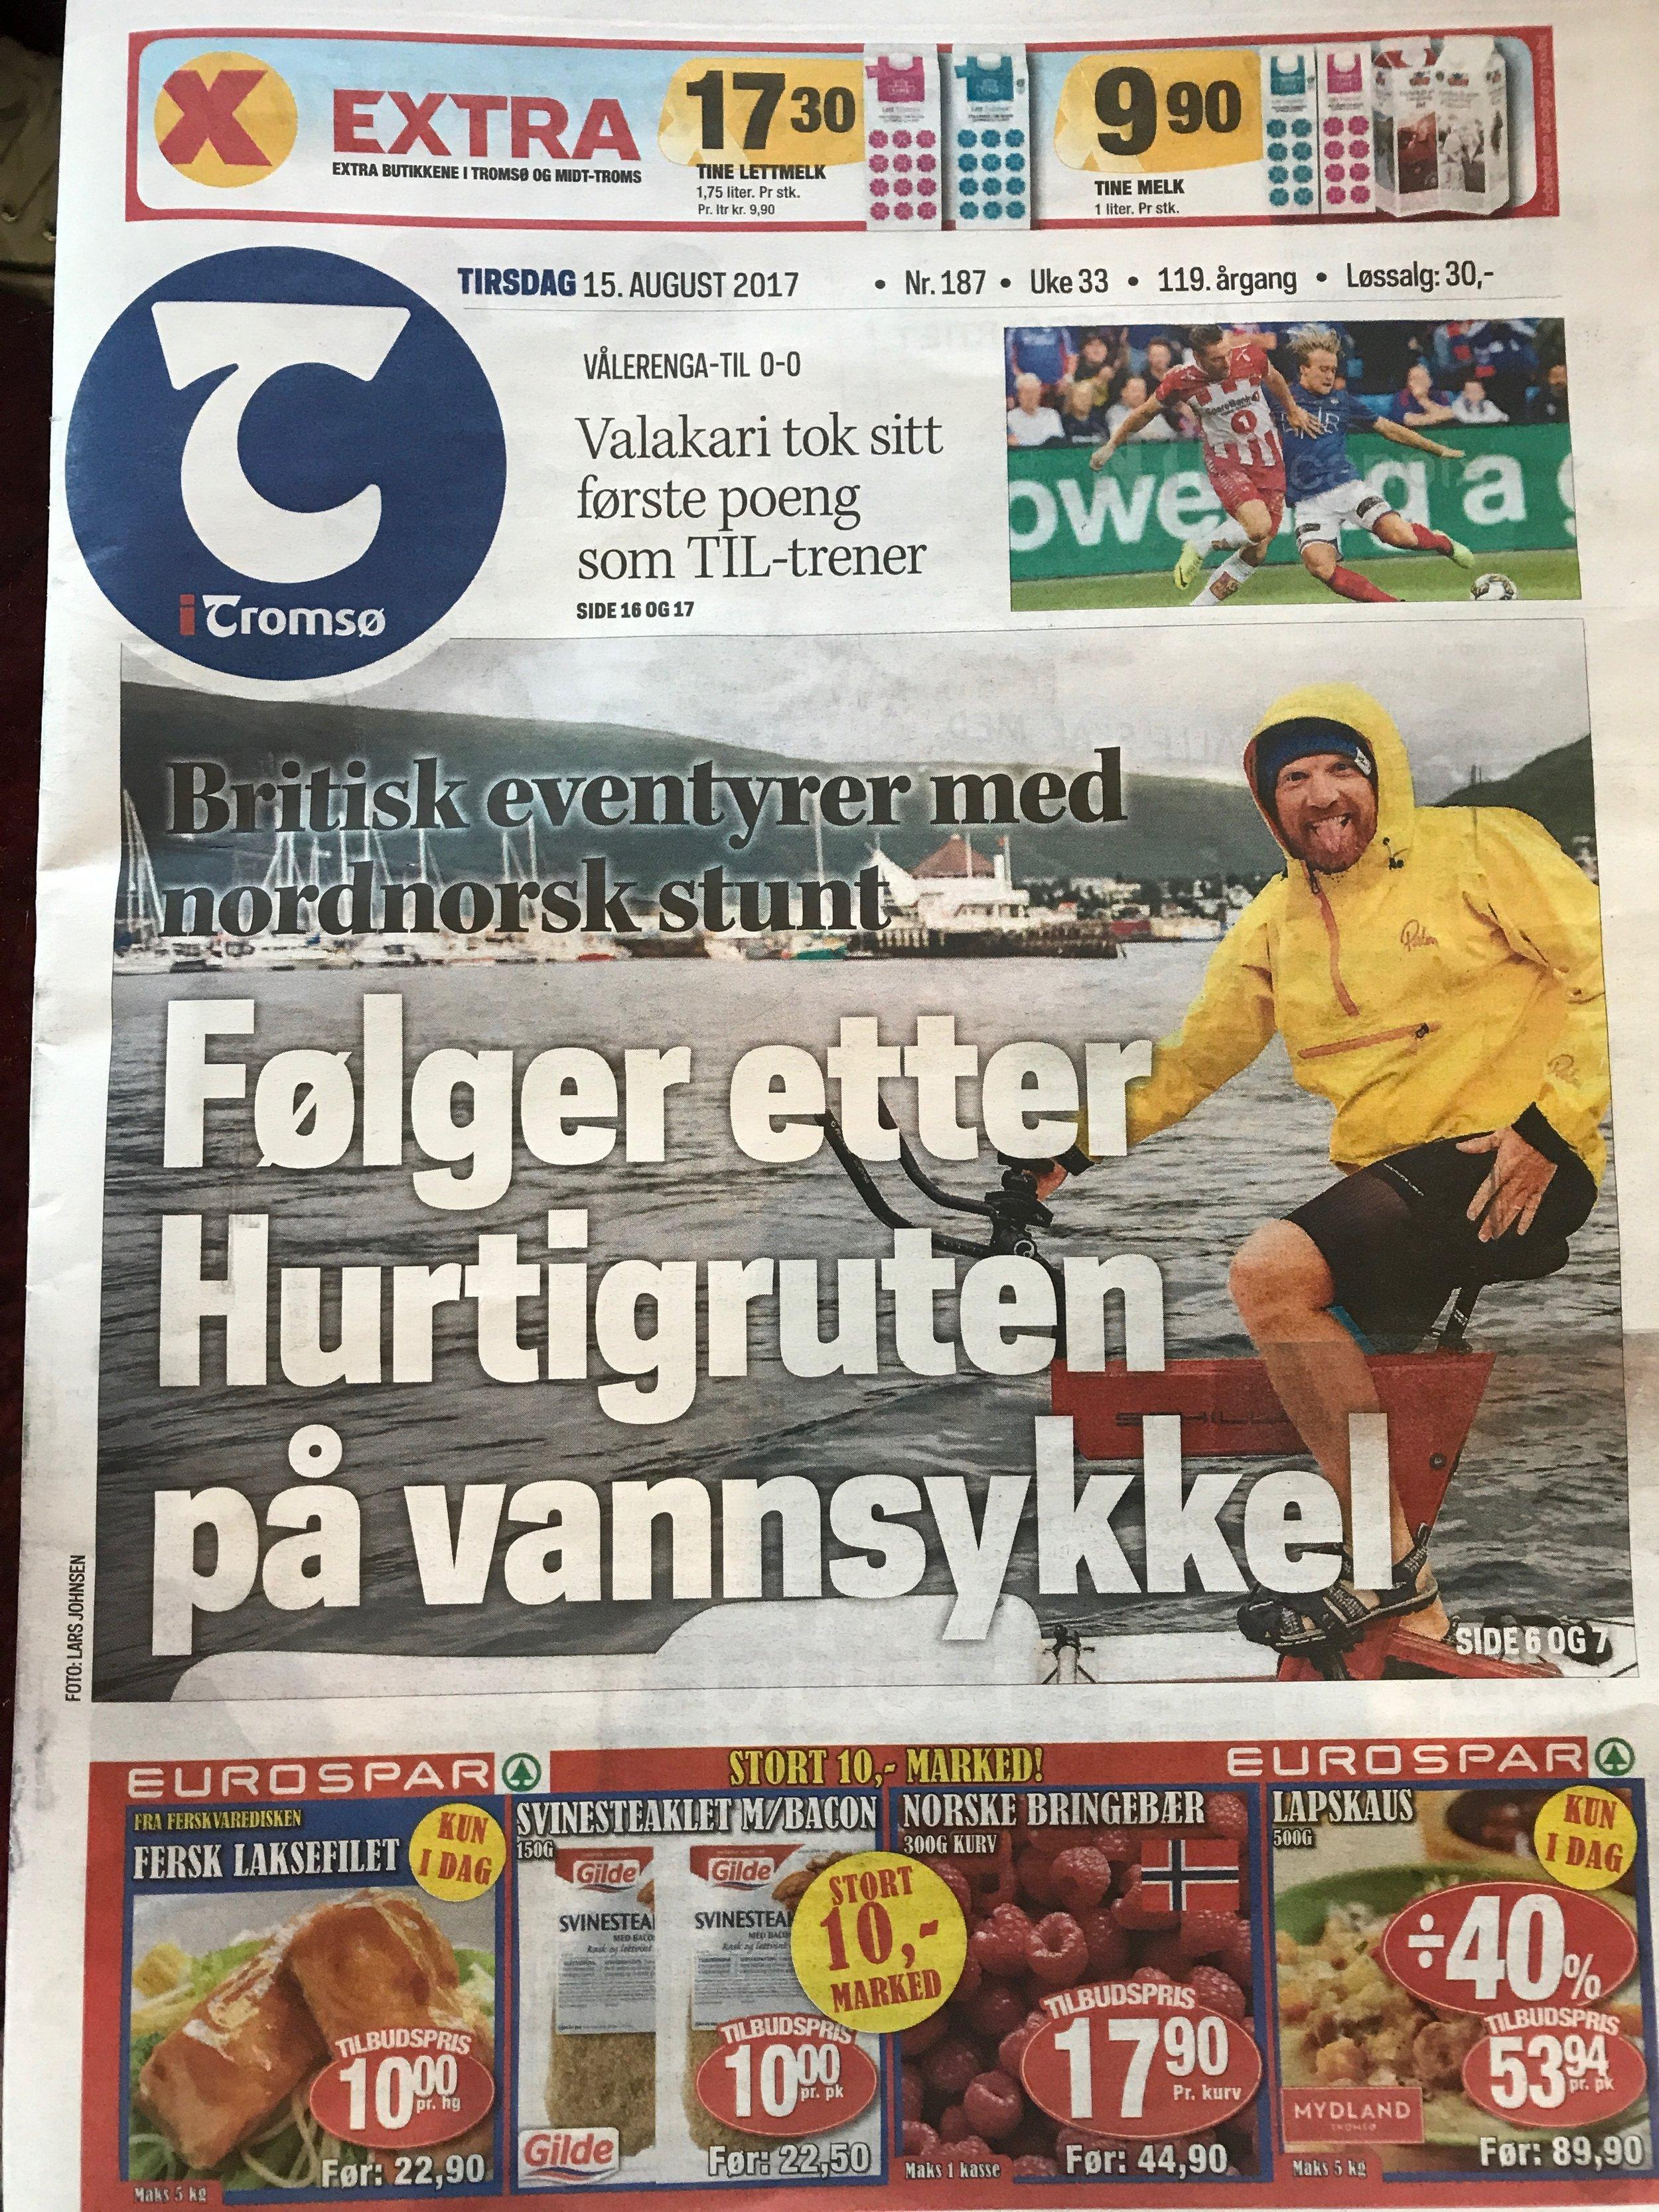 iTromso Cover - 15 August 2017.jpeg